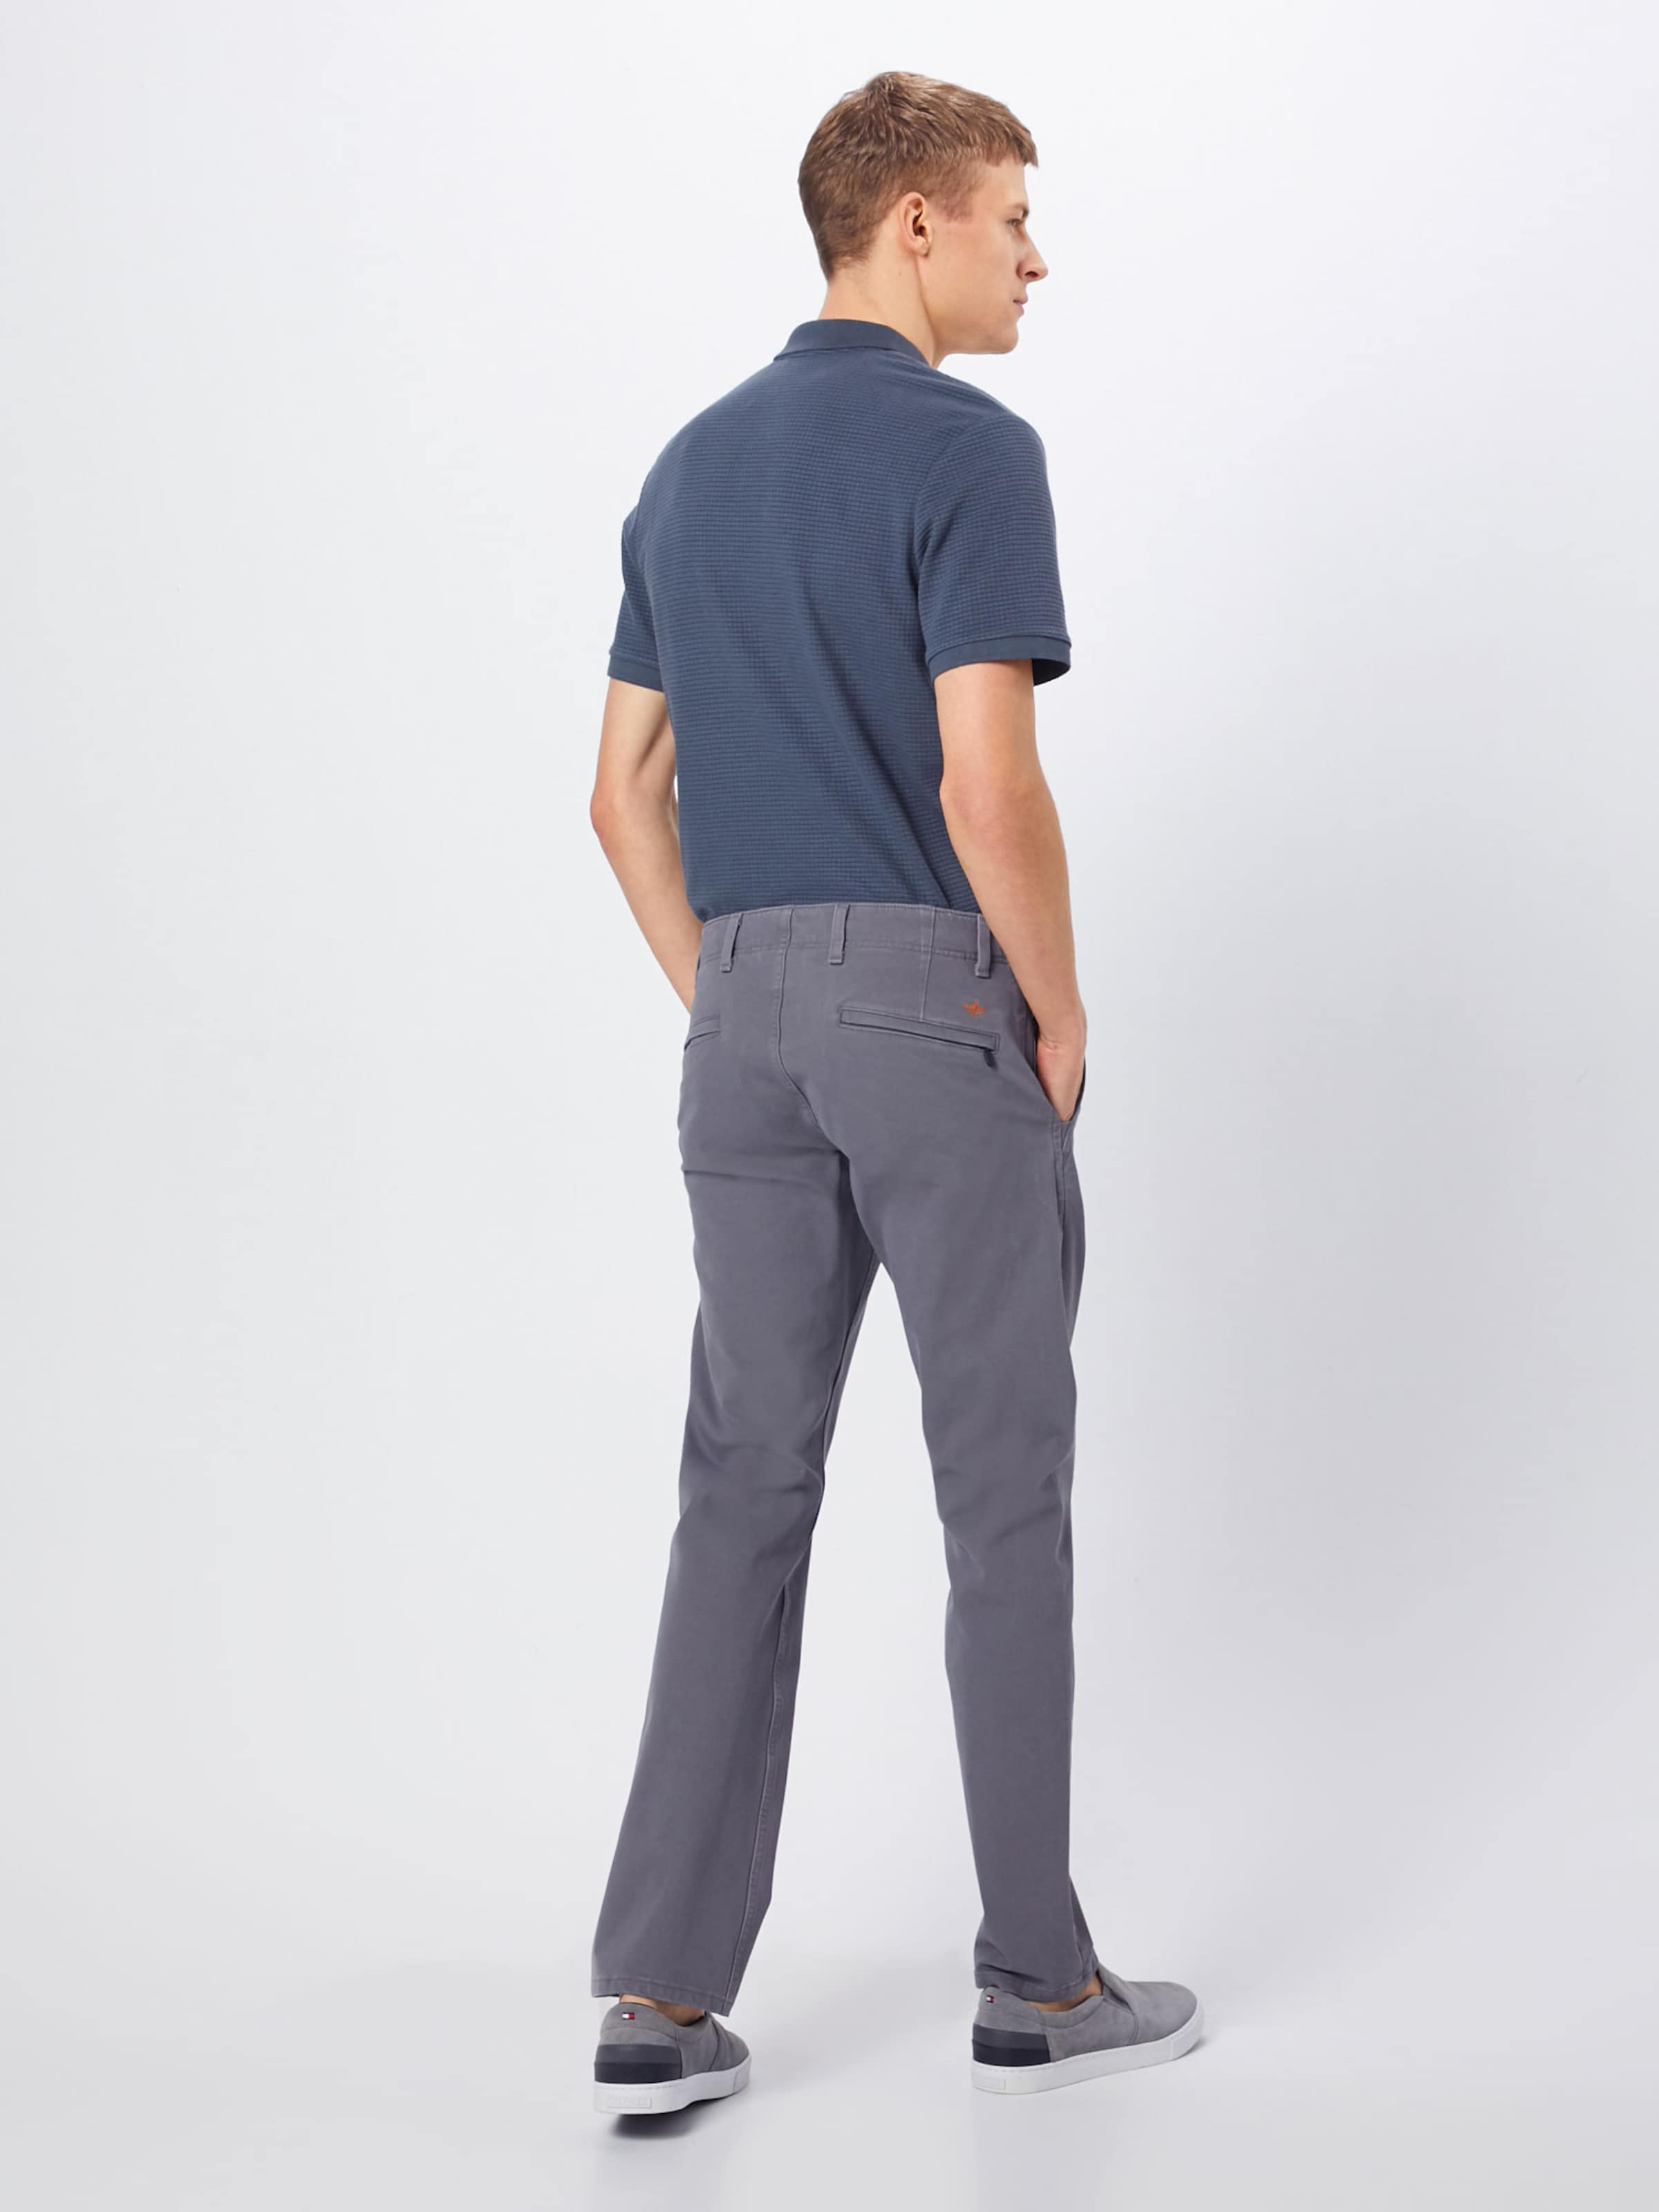 ' Pantalon Flex 360 Slimtapered Gris Dockers 'smart En Alpha dthrsQ